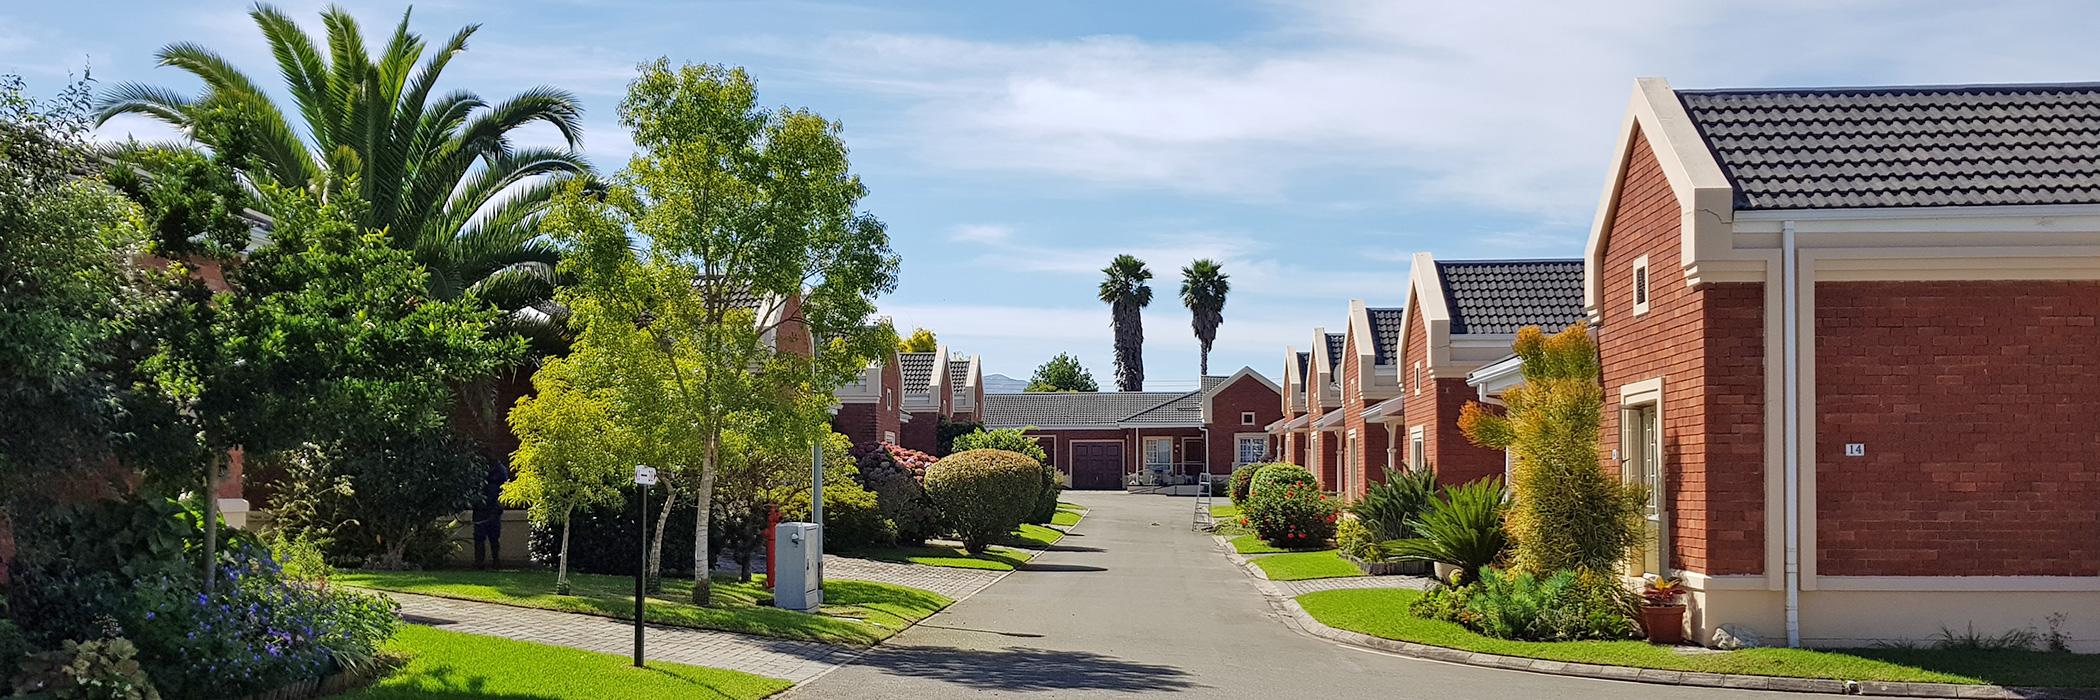 retire-to-george-bergville-retirement-village